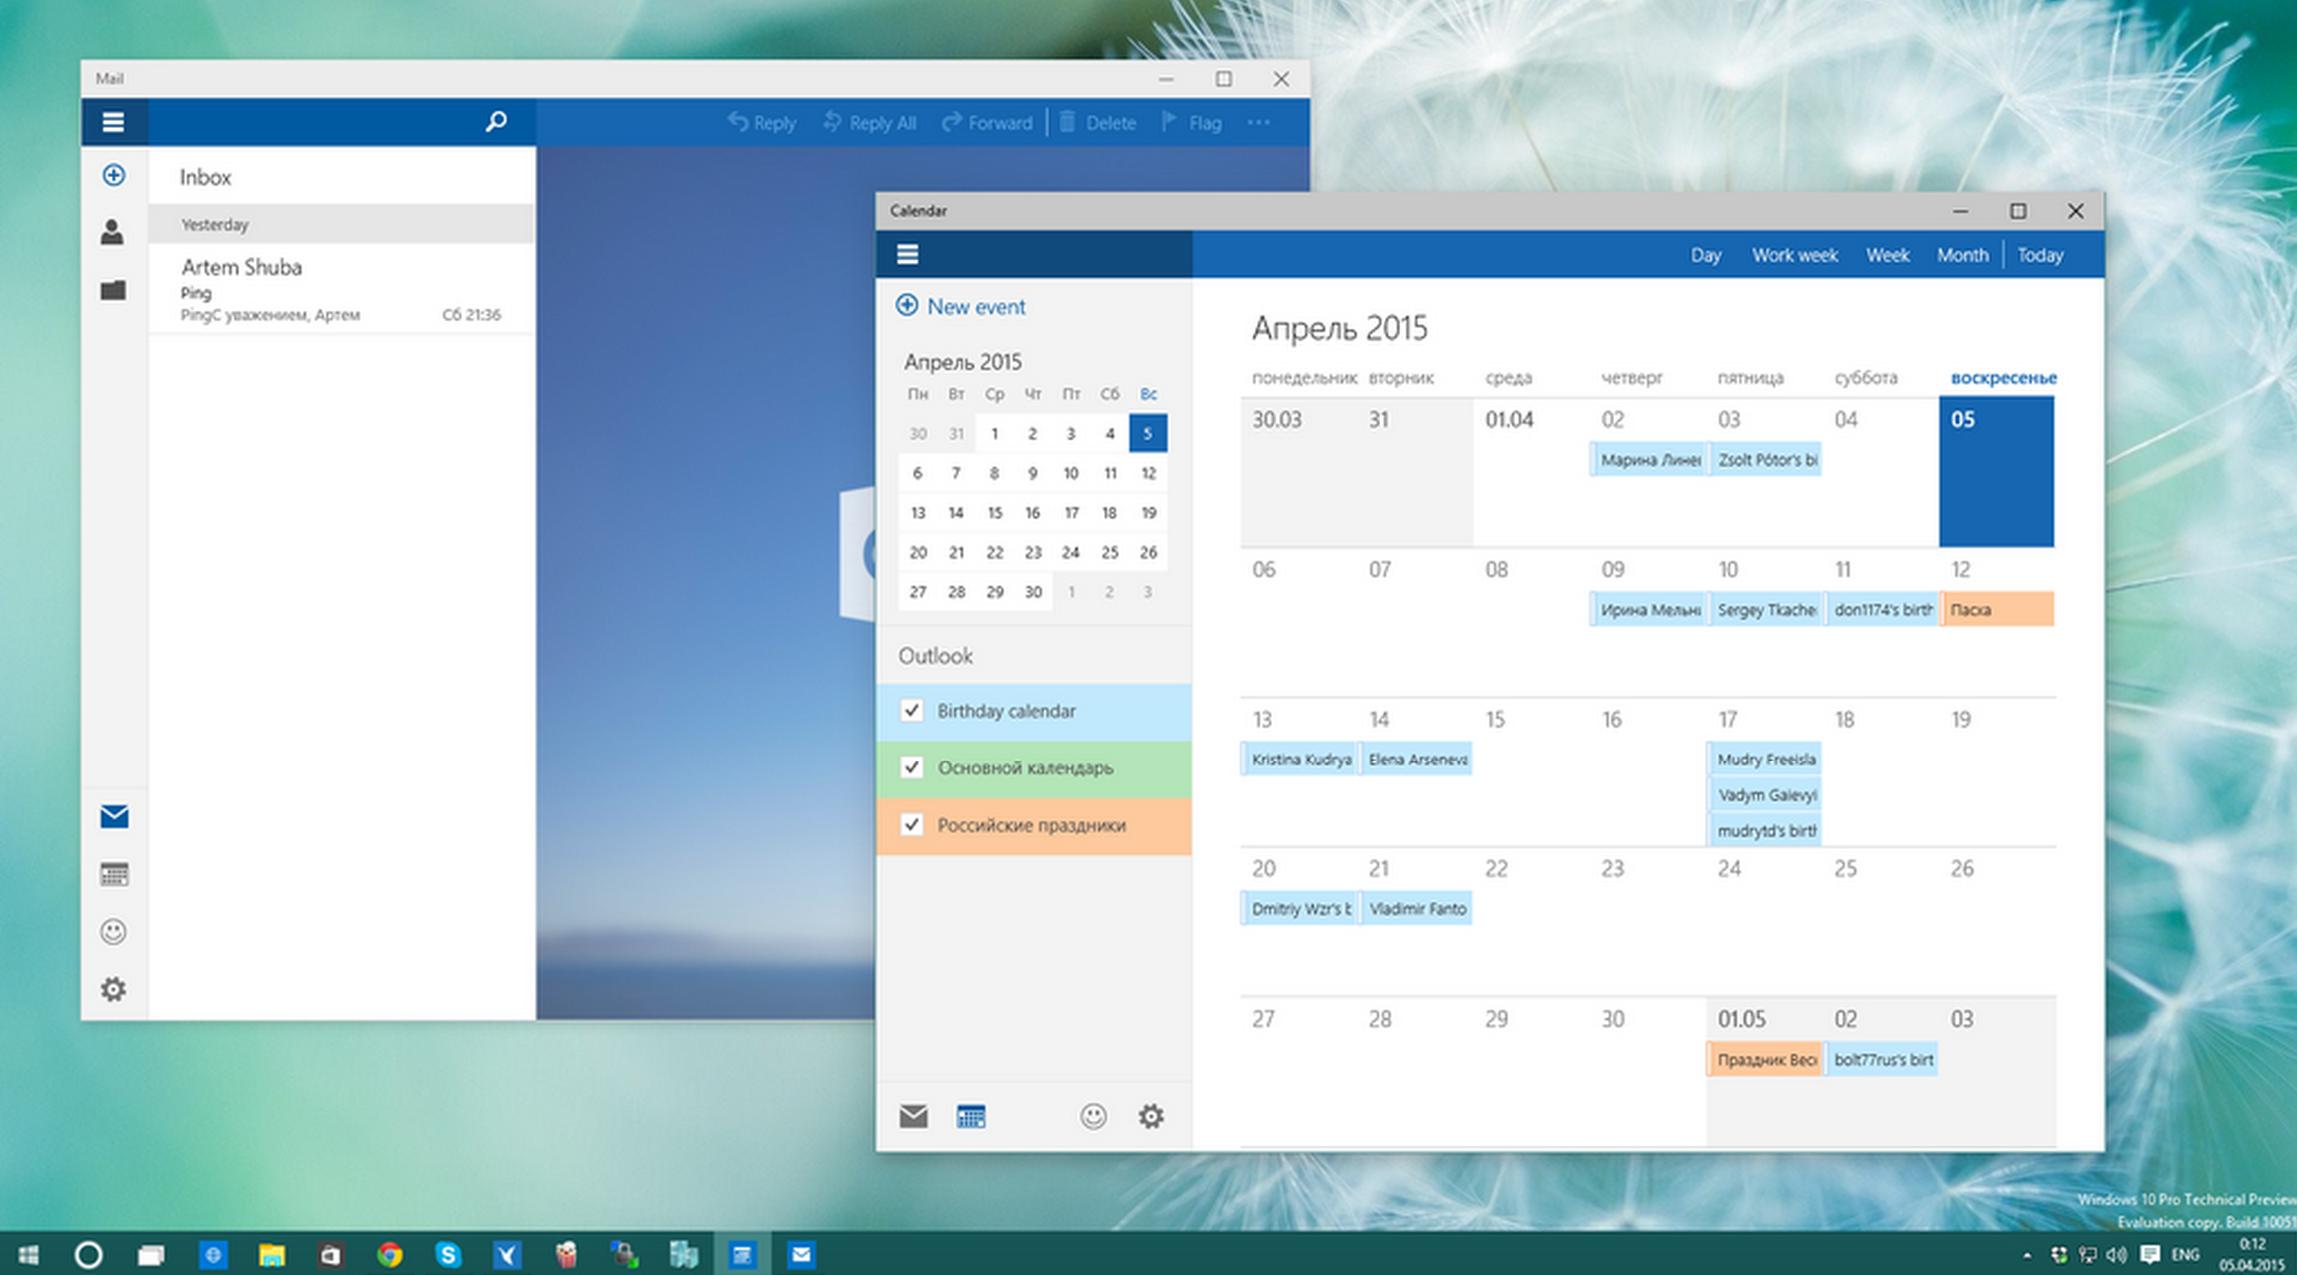 Leaked Windows 10 build brings Google Calendar support back